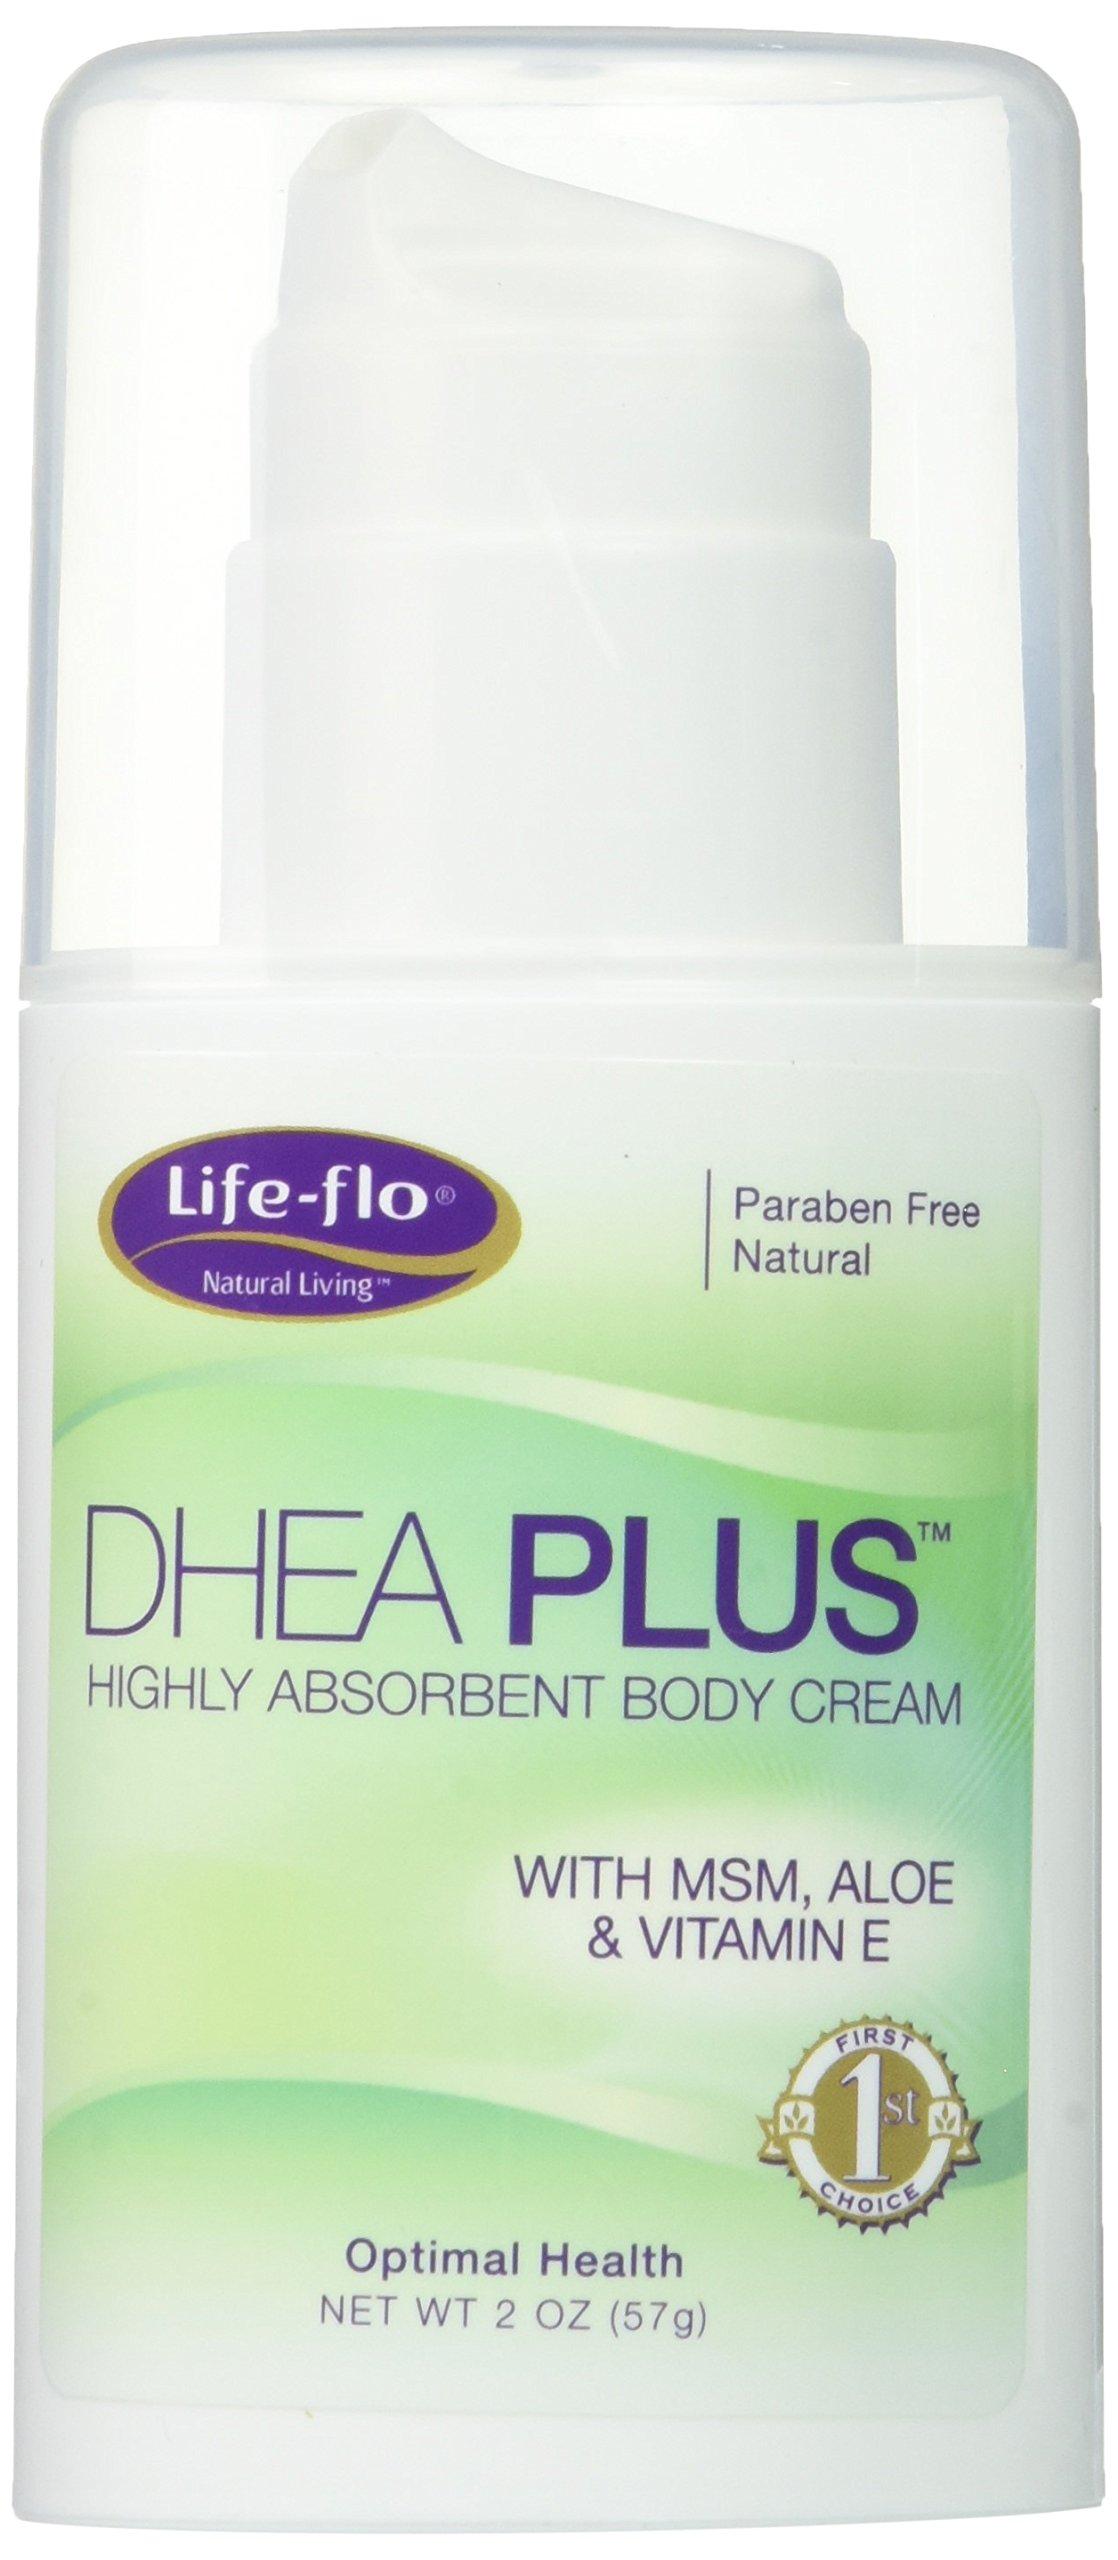 Life-Flo DHEA Plus Cream Bottles, 4 Ounce